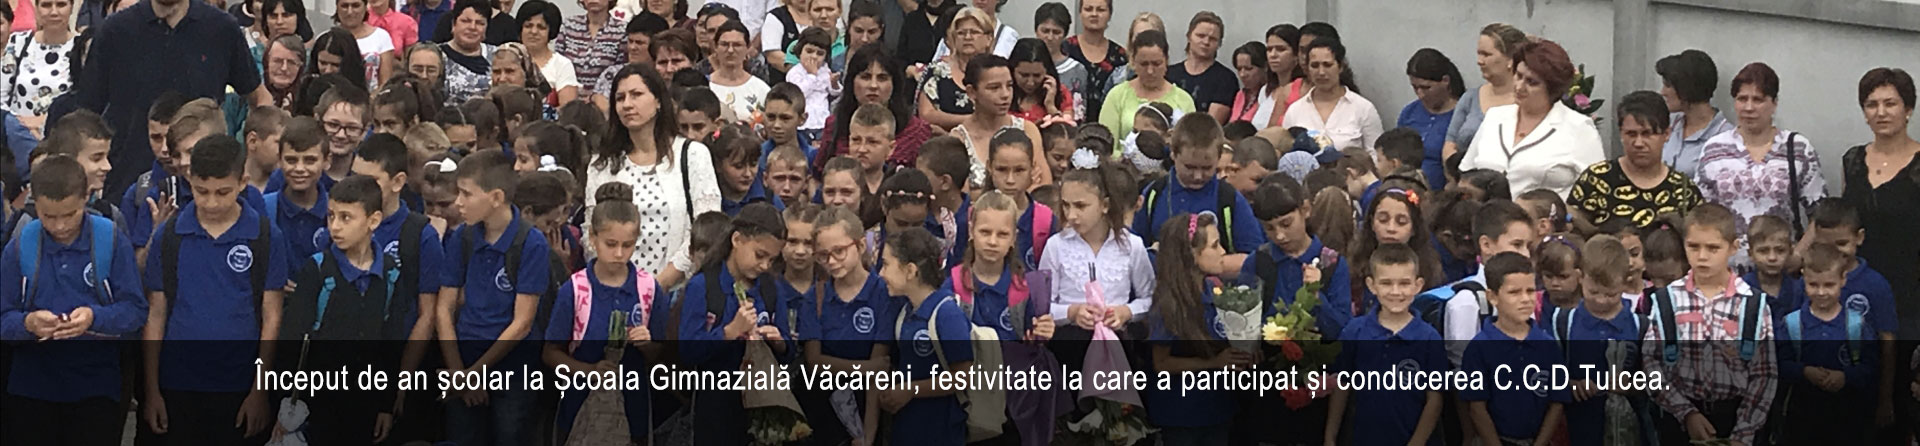 deshidere_vacareni_1920x446